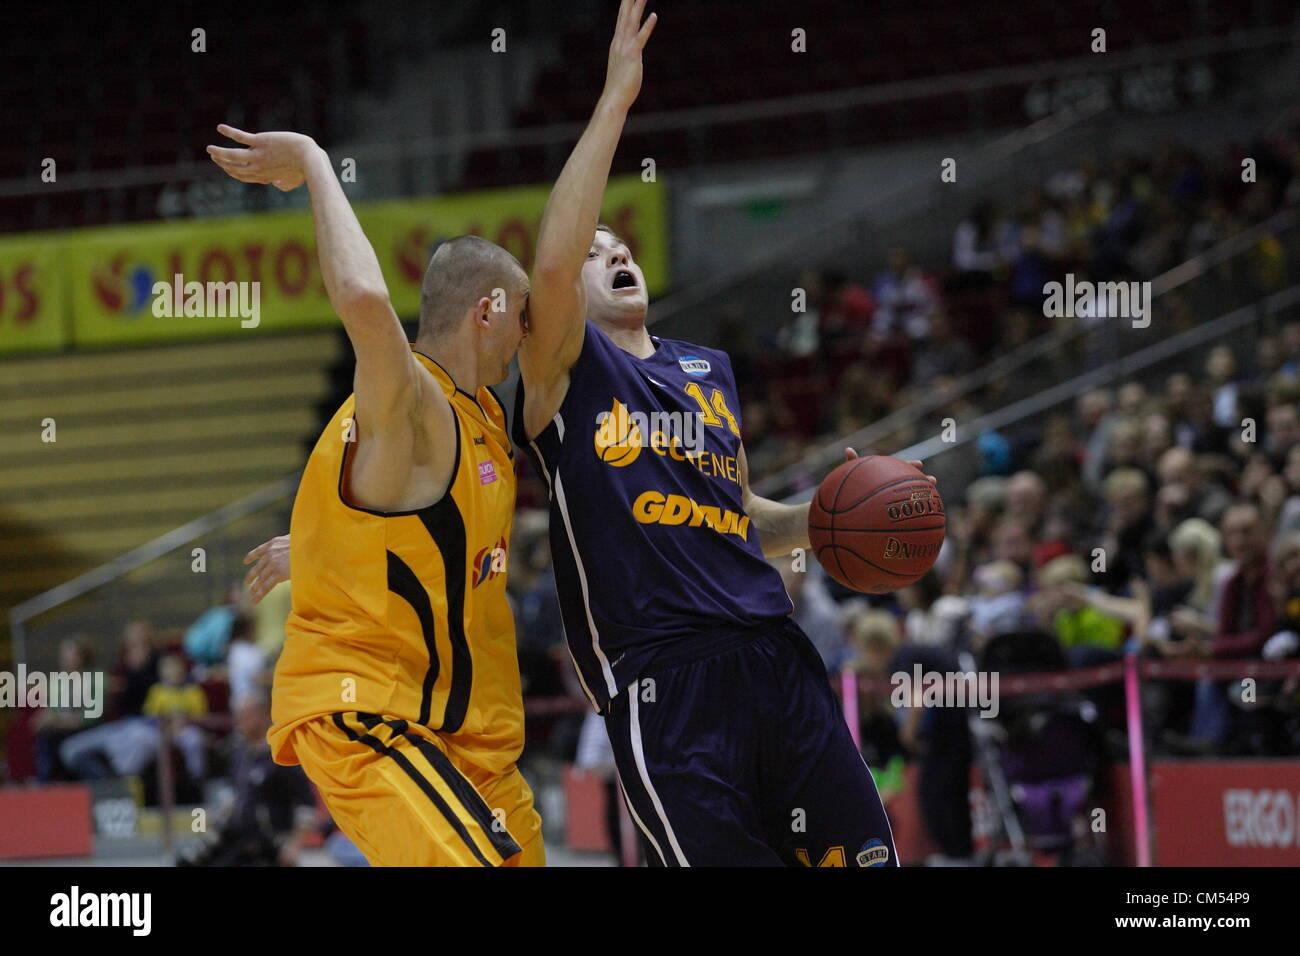 Sopot, Poland 6th, October 2012 Polish basketball extraleague - Tauron Basket Liga.Michal Jankowski (14) in action - Stock Image